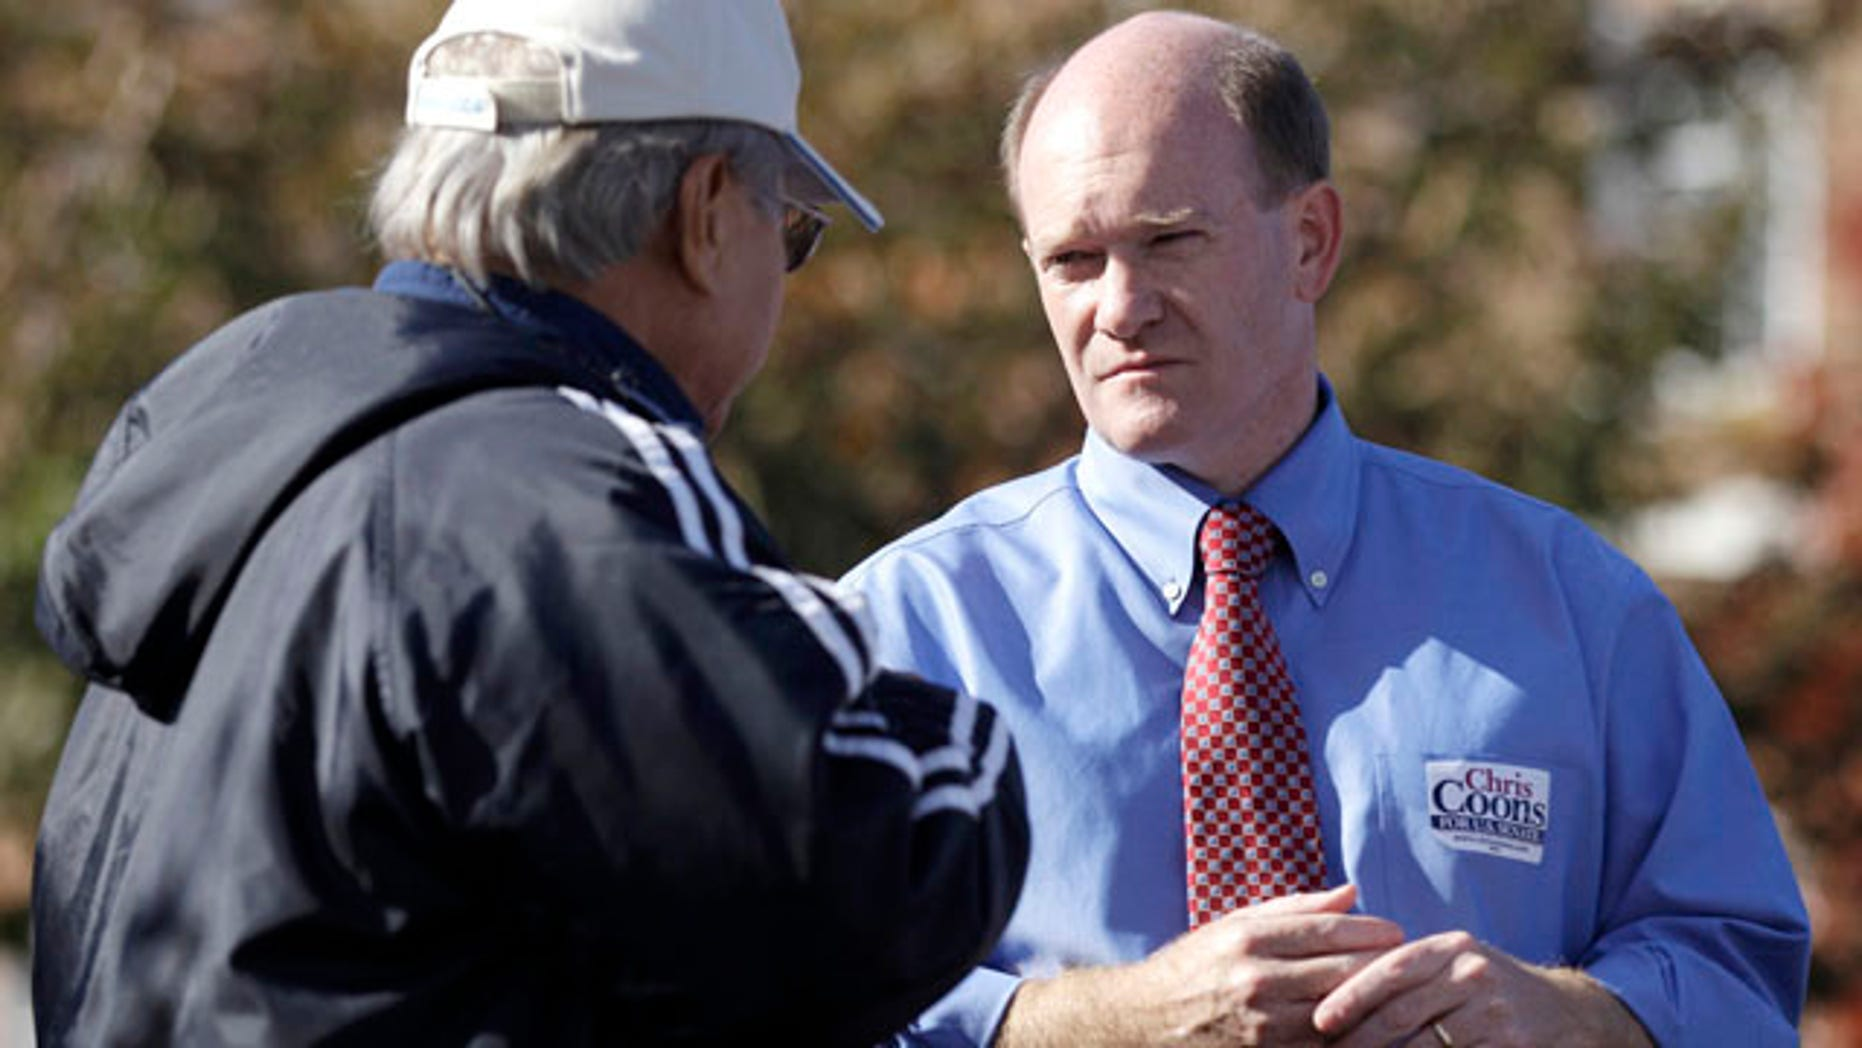 Nov. 2: Delaware Democratic Senate candidate Chris Coons, right, talks with Venerando Maximo, outside a polling station in Dover, Del.